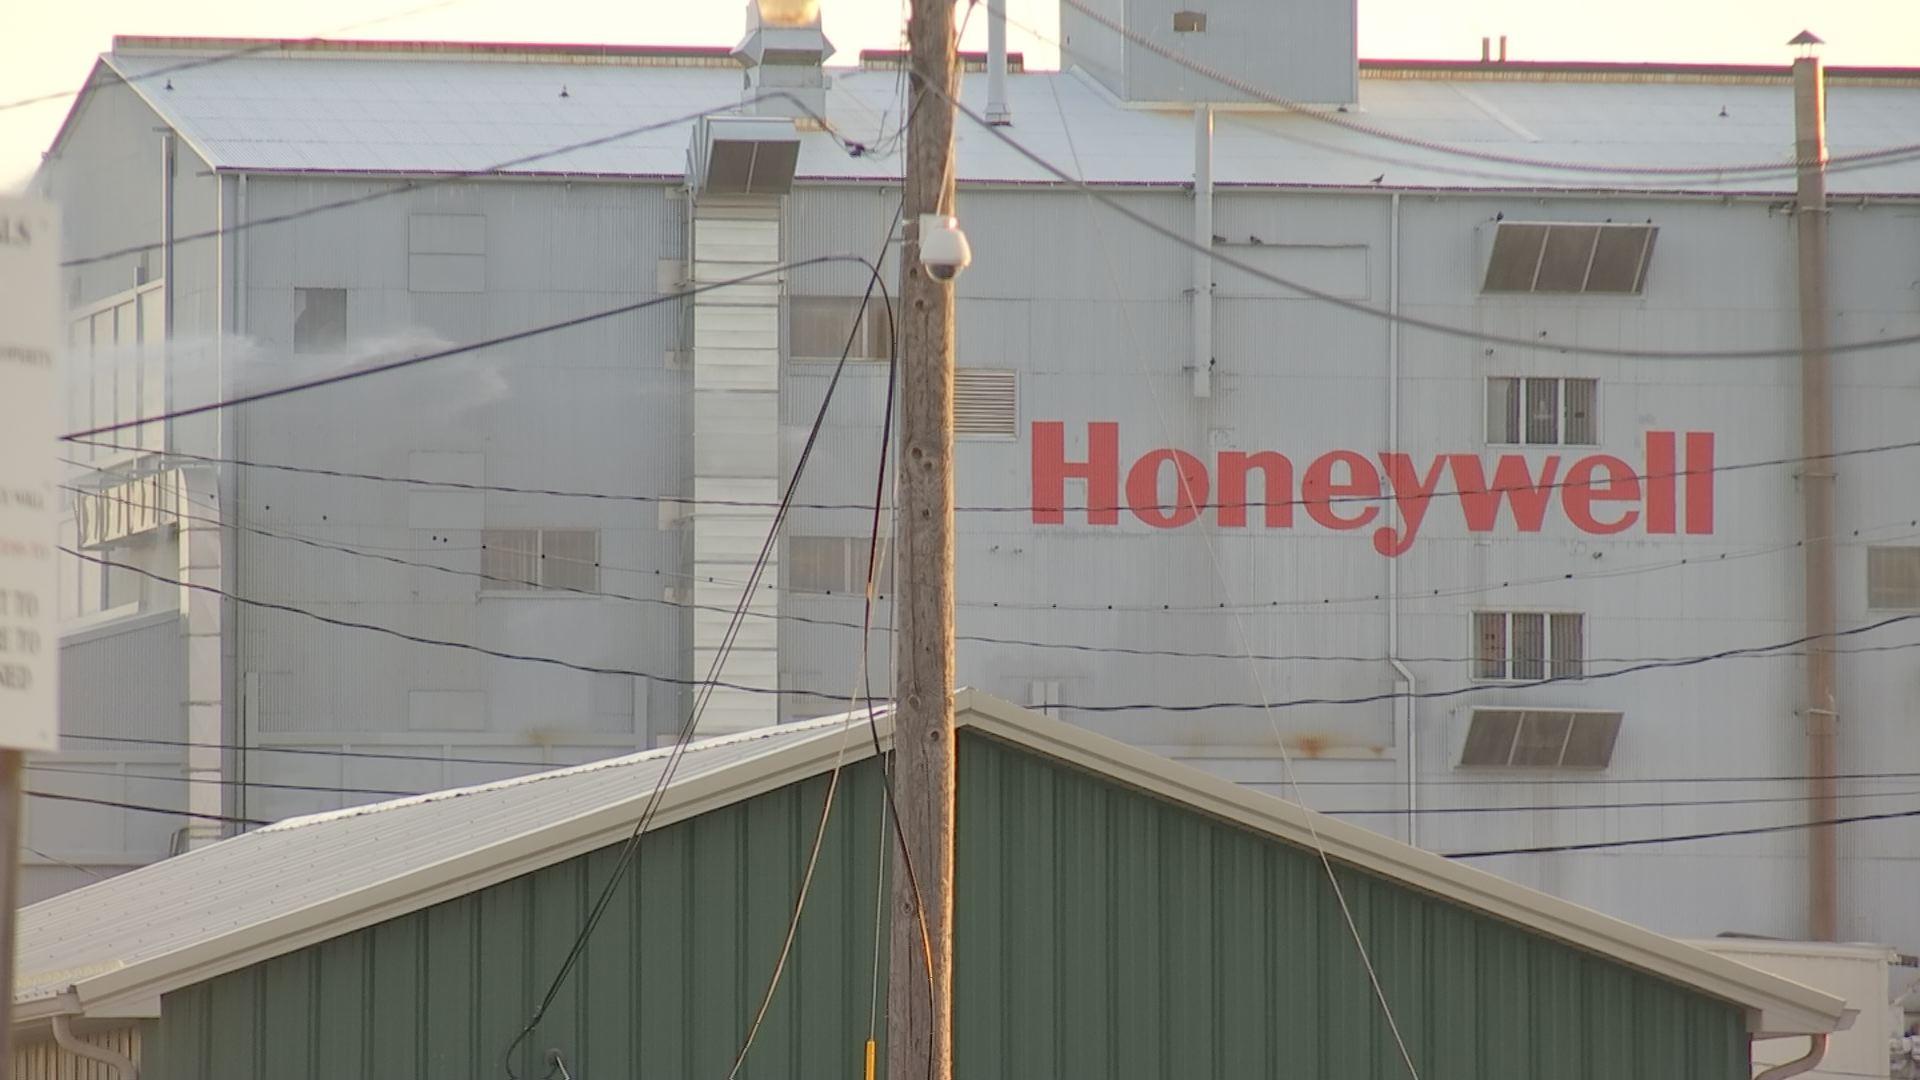 Honeywell to test on-site siren tomorrow - WPSD Local 6 ...